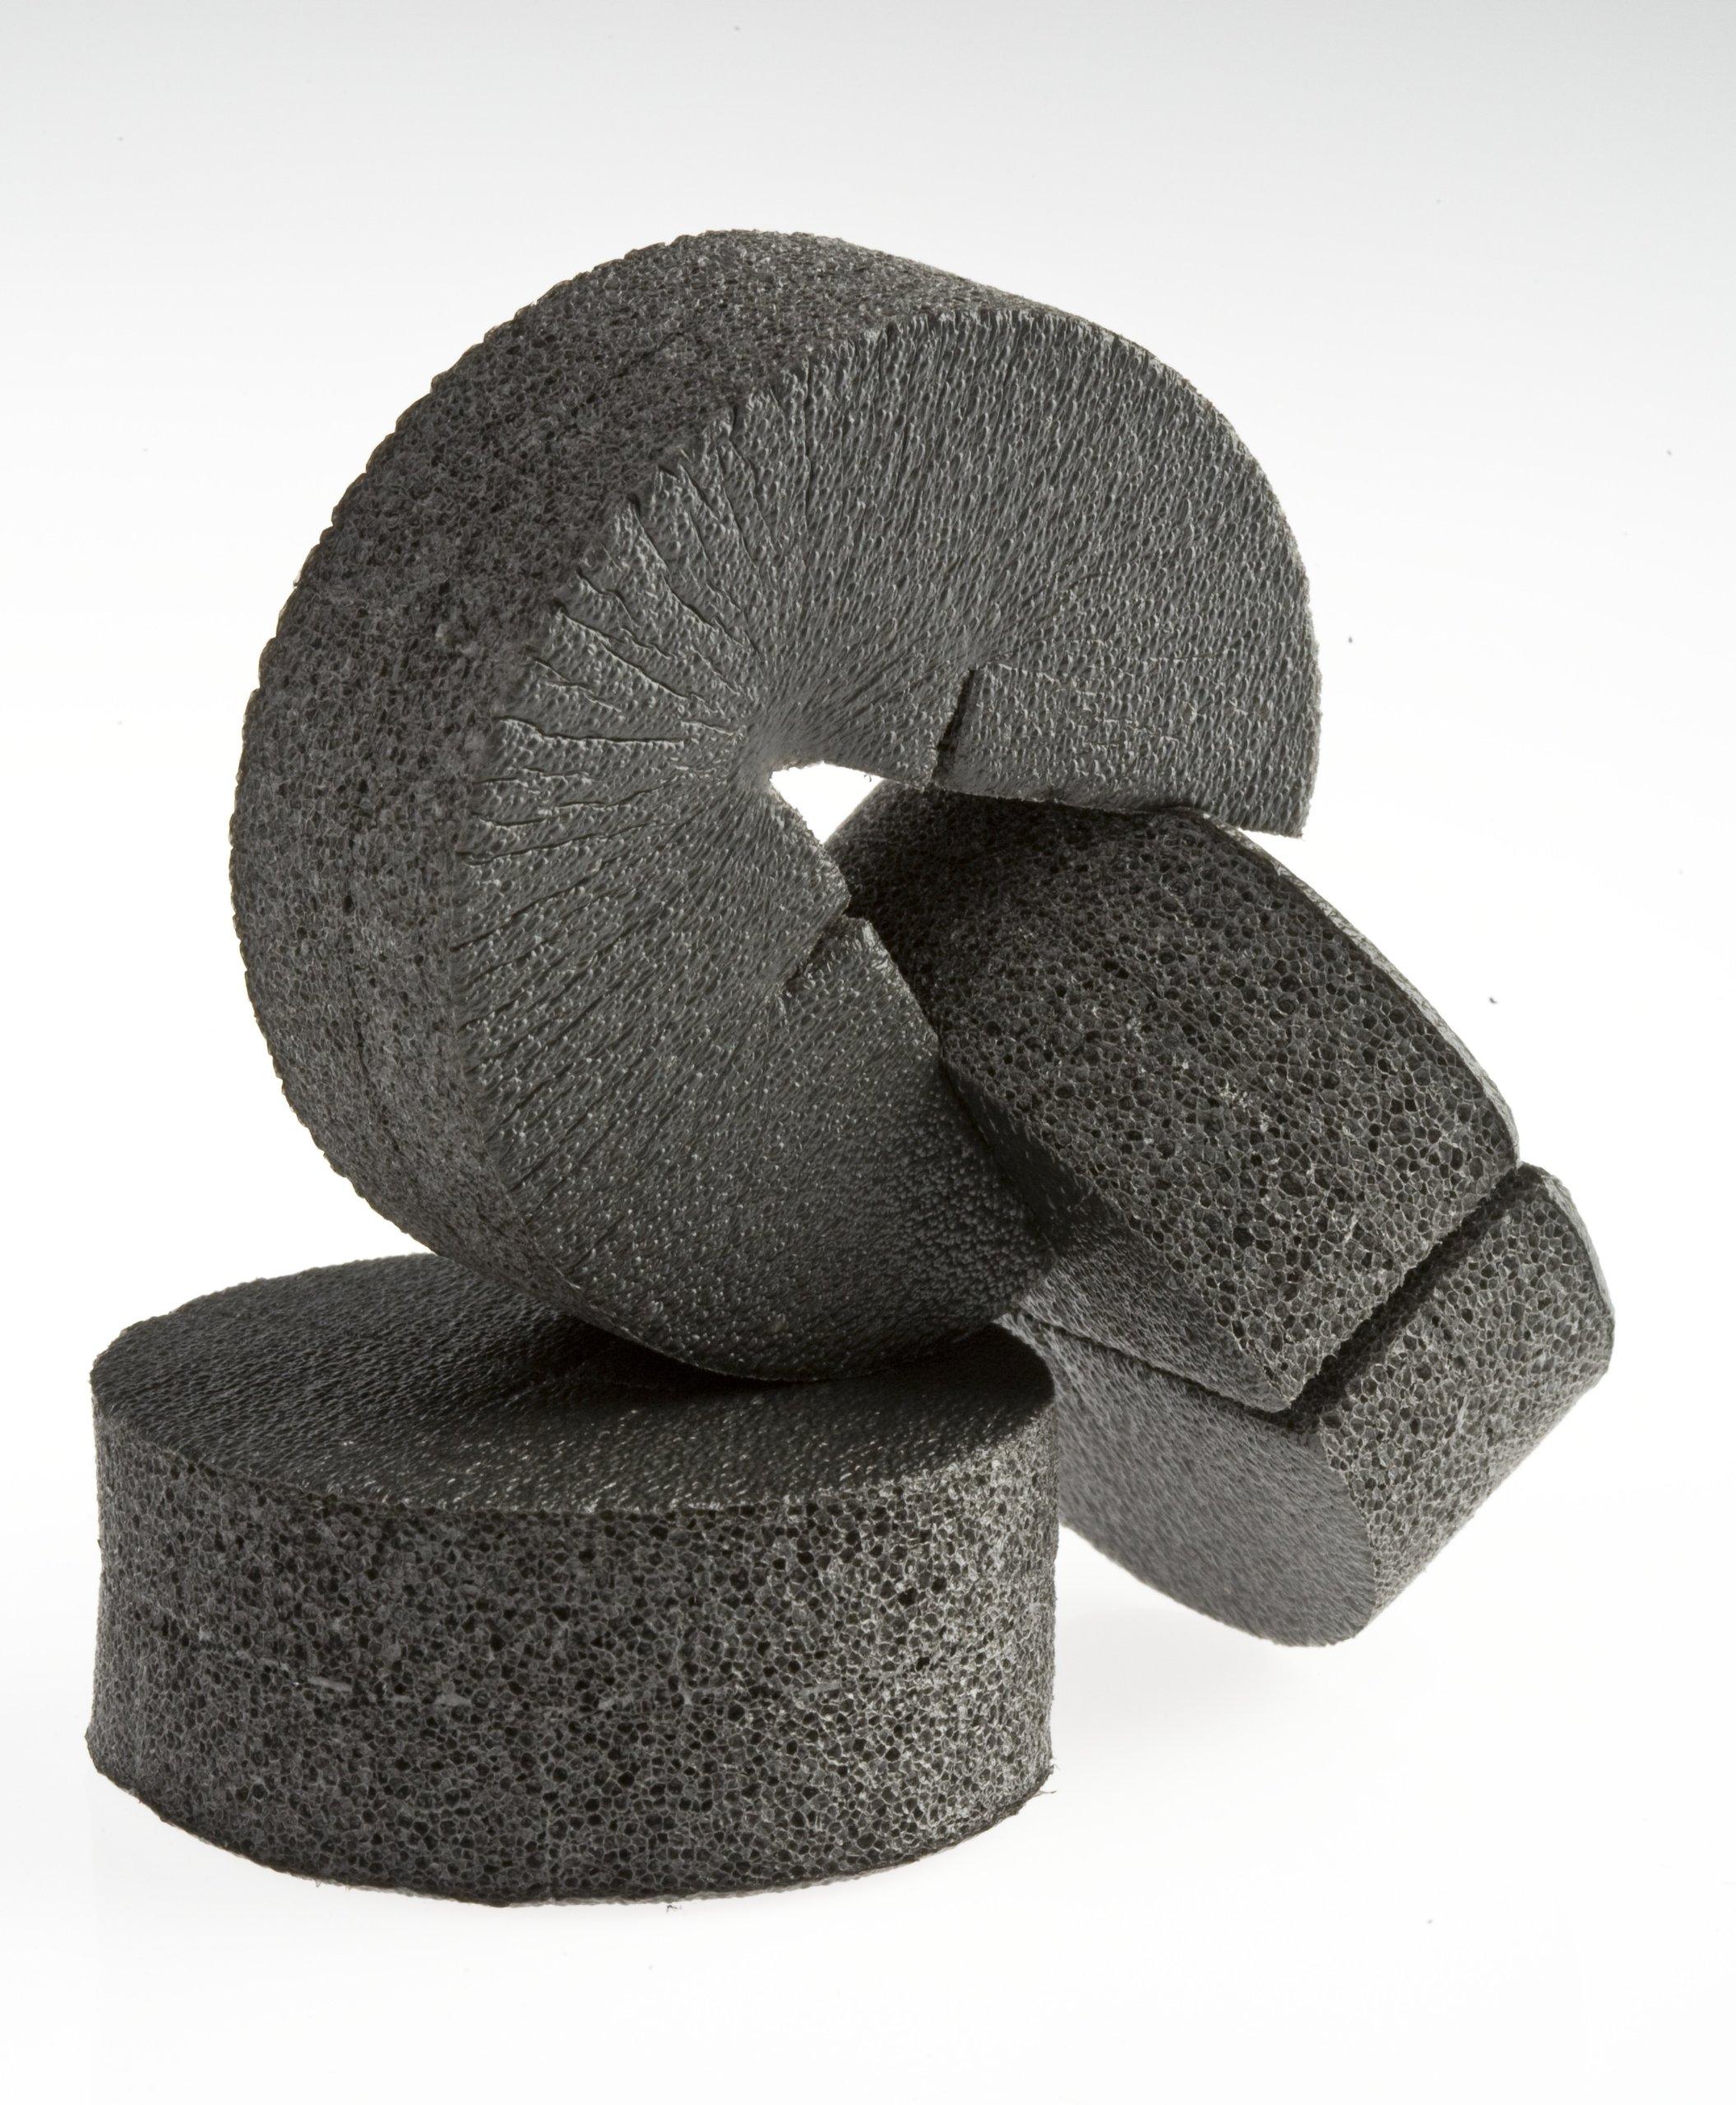 EZ-CLONE 280 Hard Plant Cloning Collars